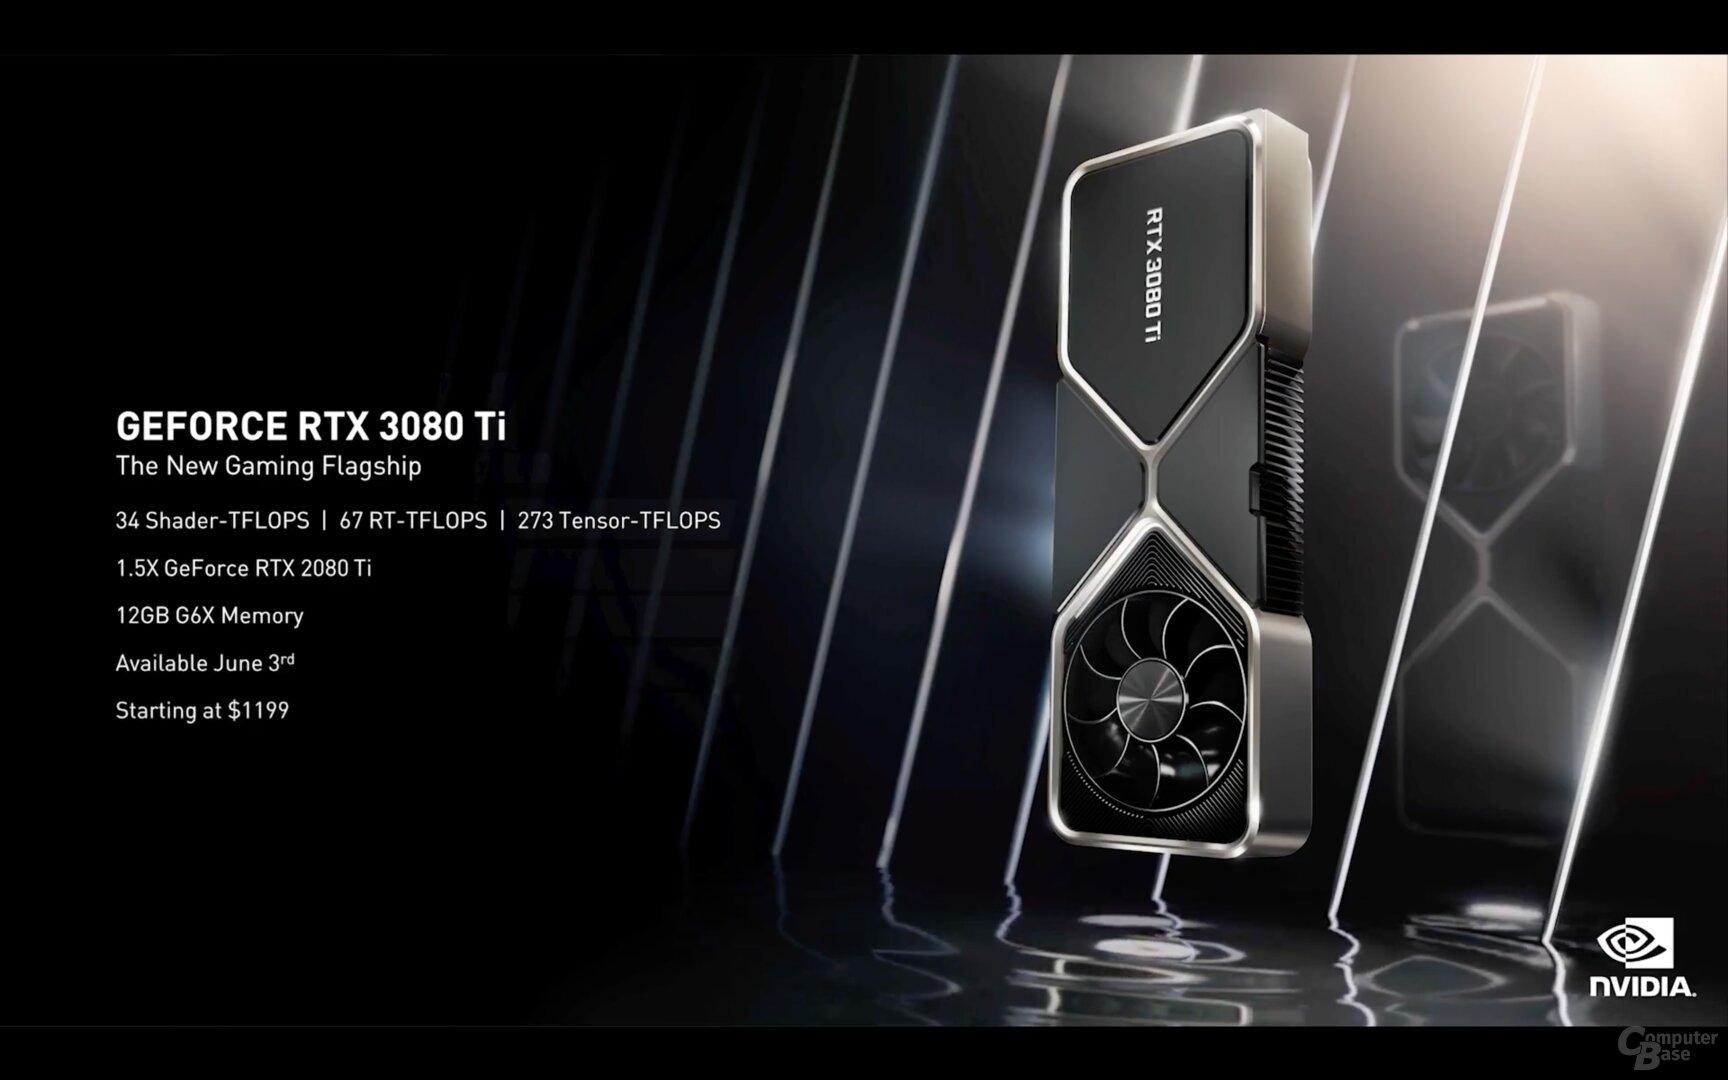 La nueva Nvidia GeForce RTX 3080 Ti